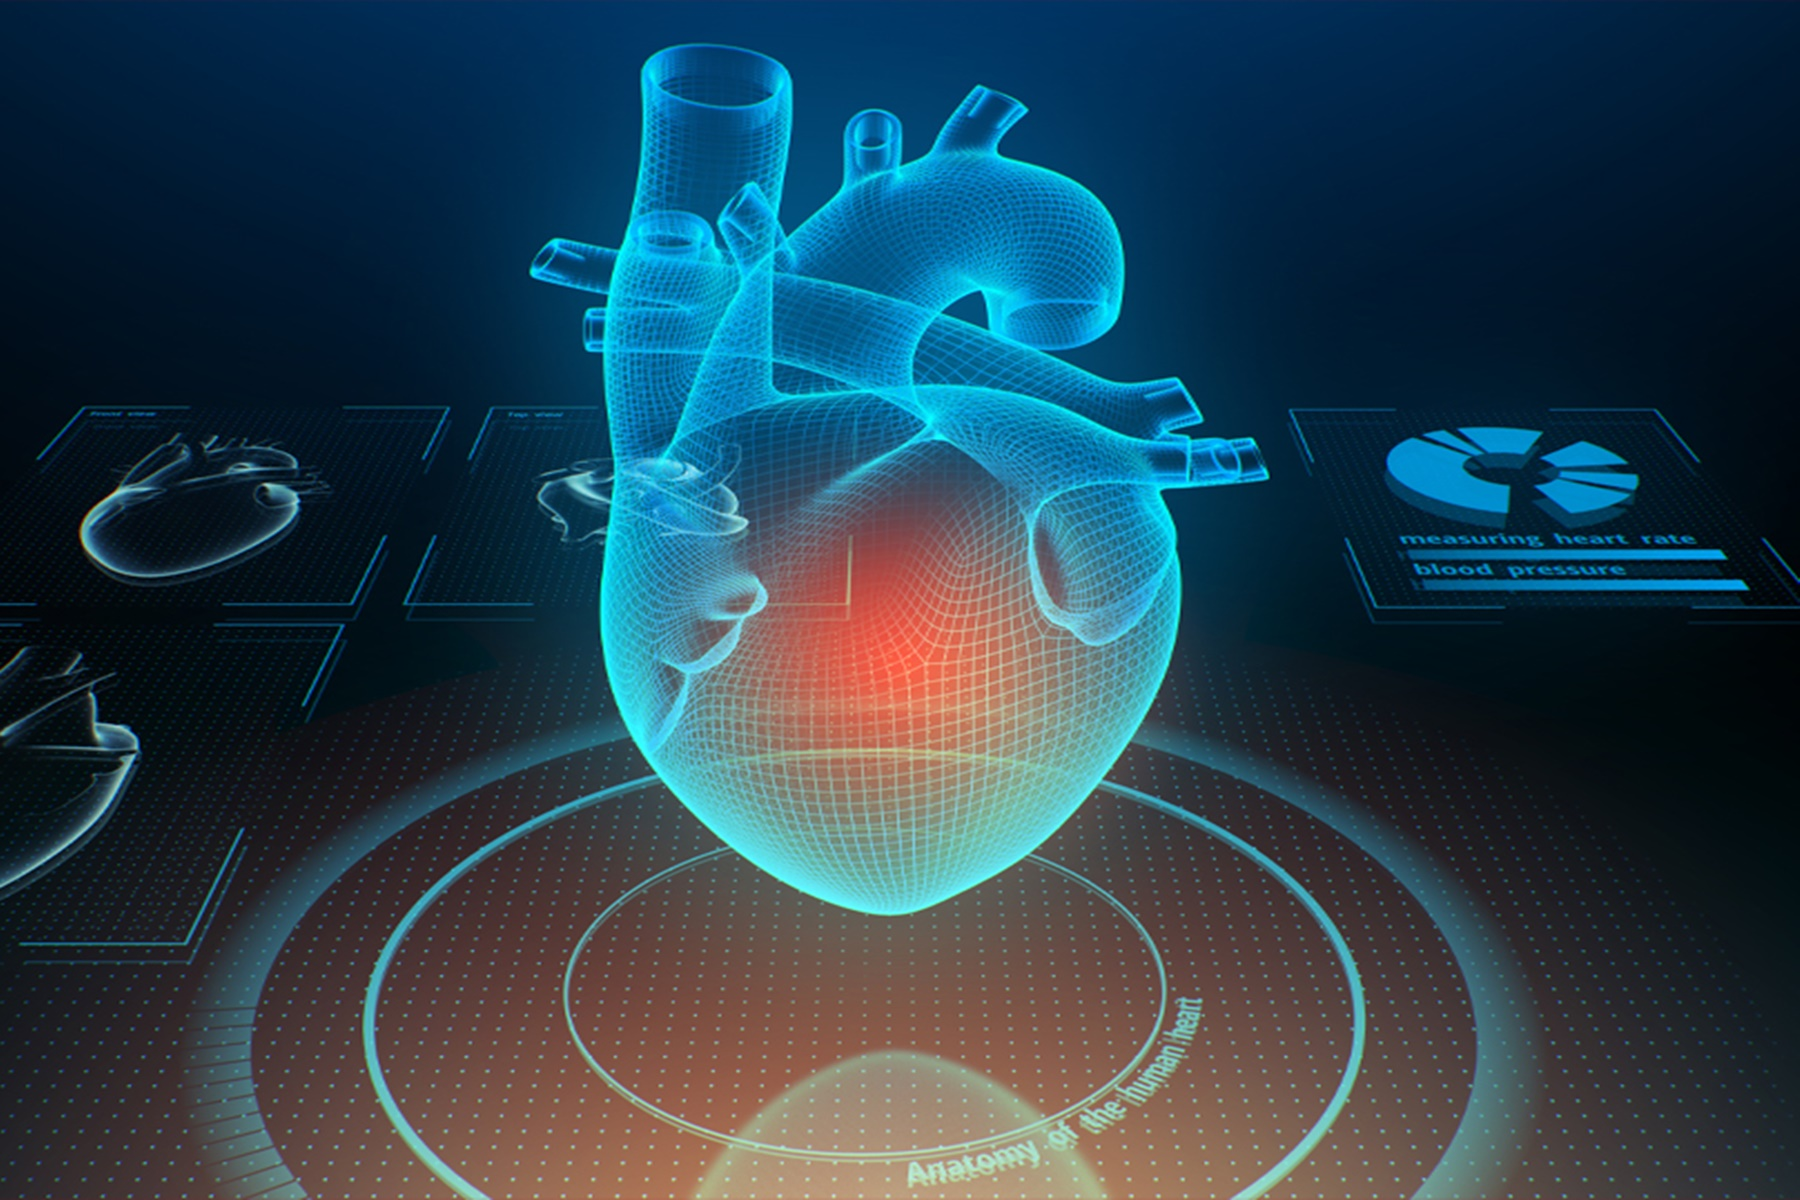 Metropolitan general : Διαθέτει μηχάνημα για ακριβή εξέταση μαγνητικής καρδιάς